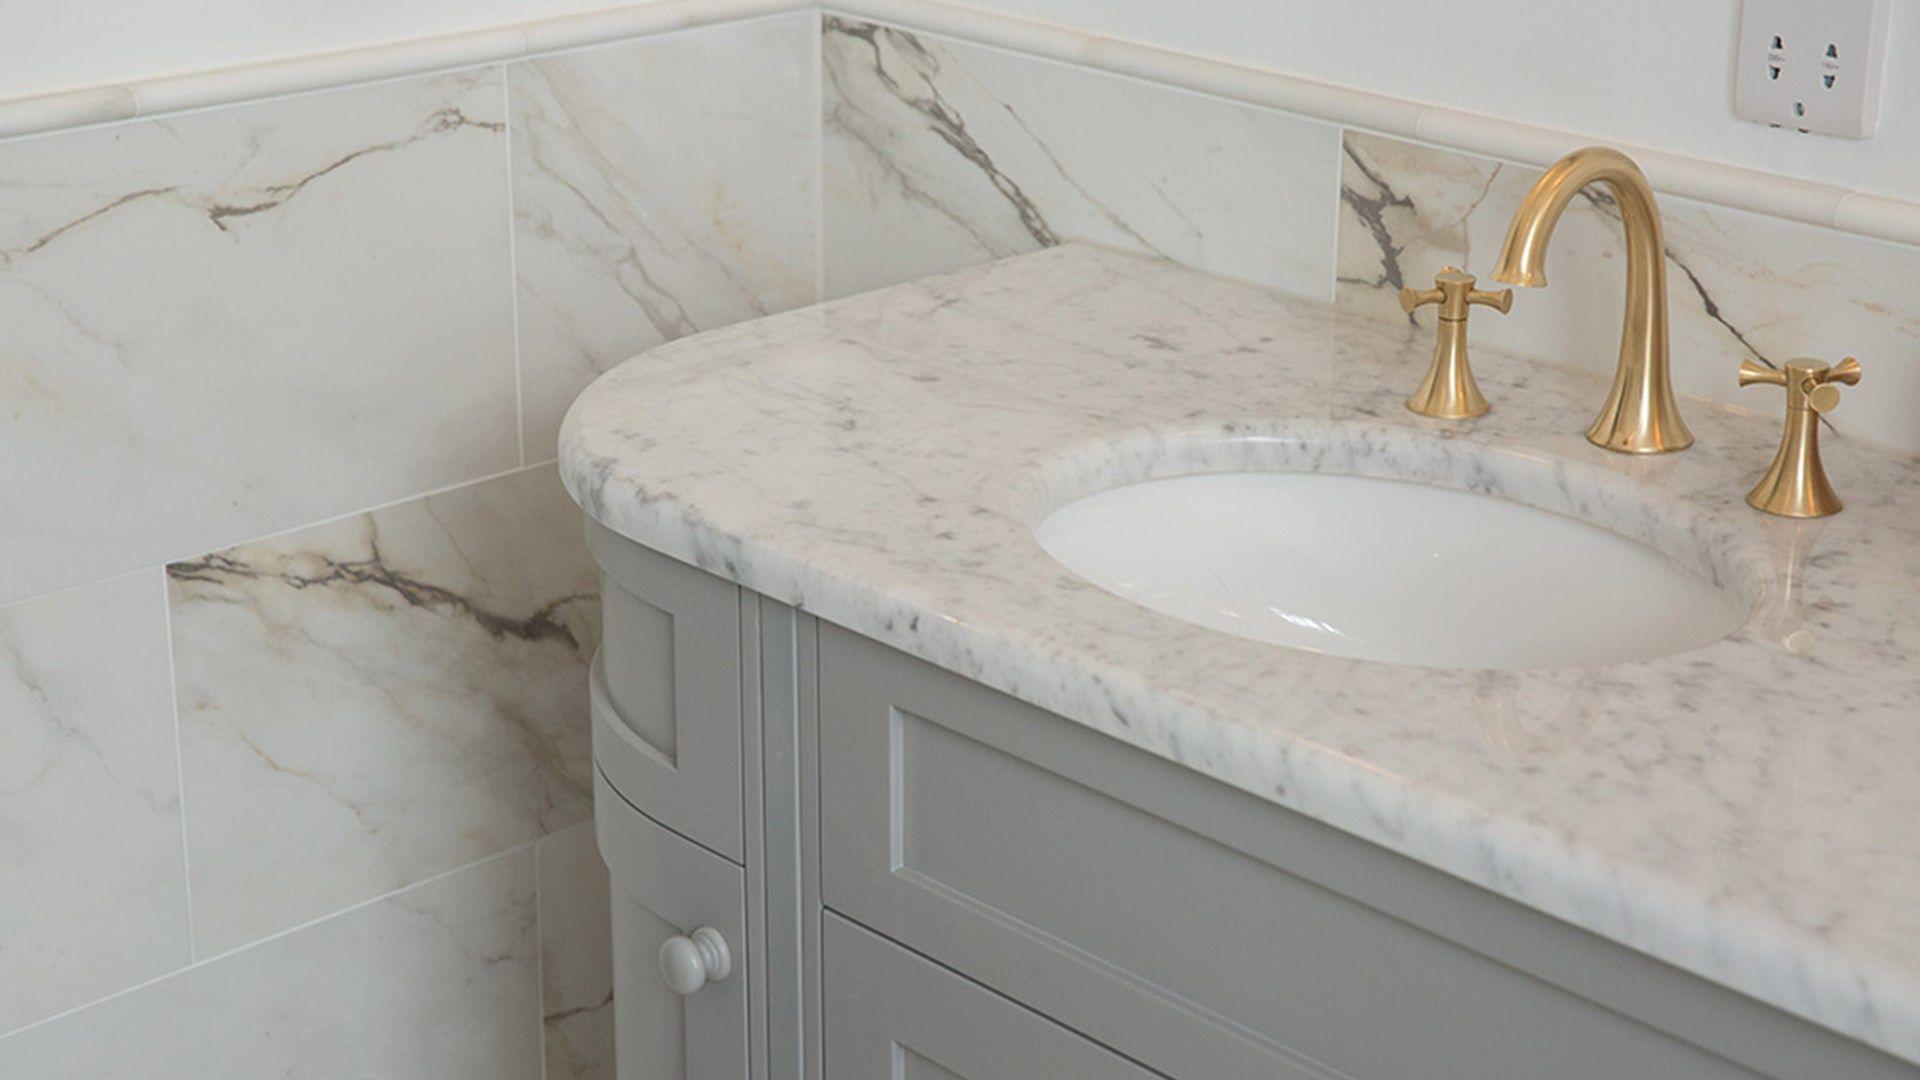 How To Create A Luxury Bathroom On A Budget Using Tiles Budget Bathroom Luxury Bathroom Tile Bathroom